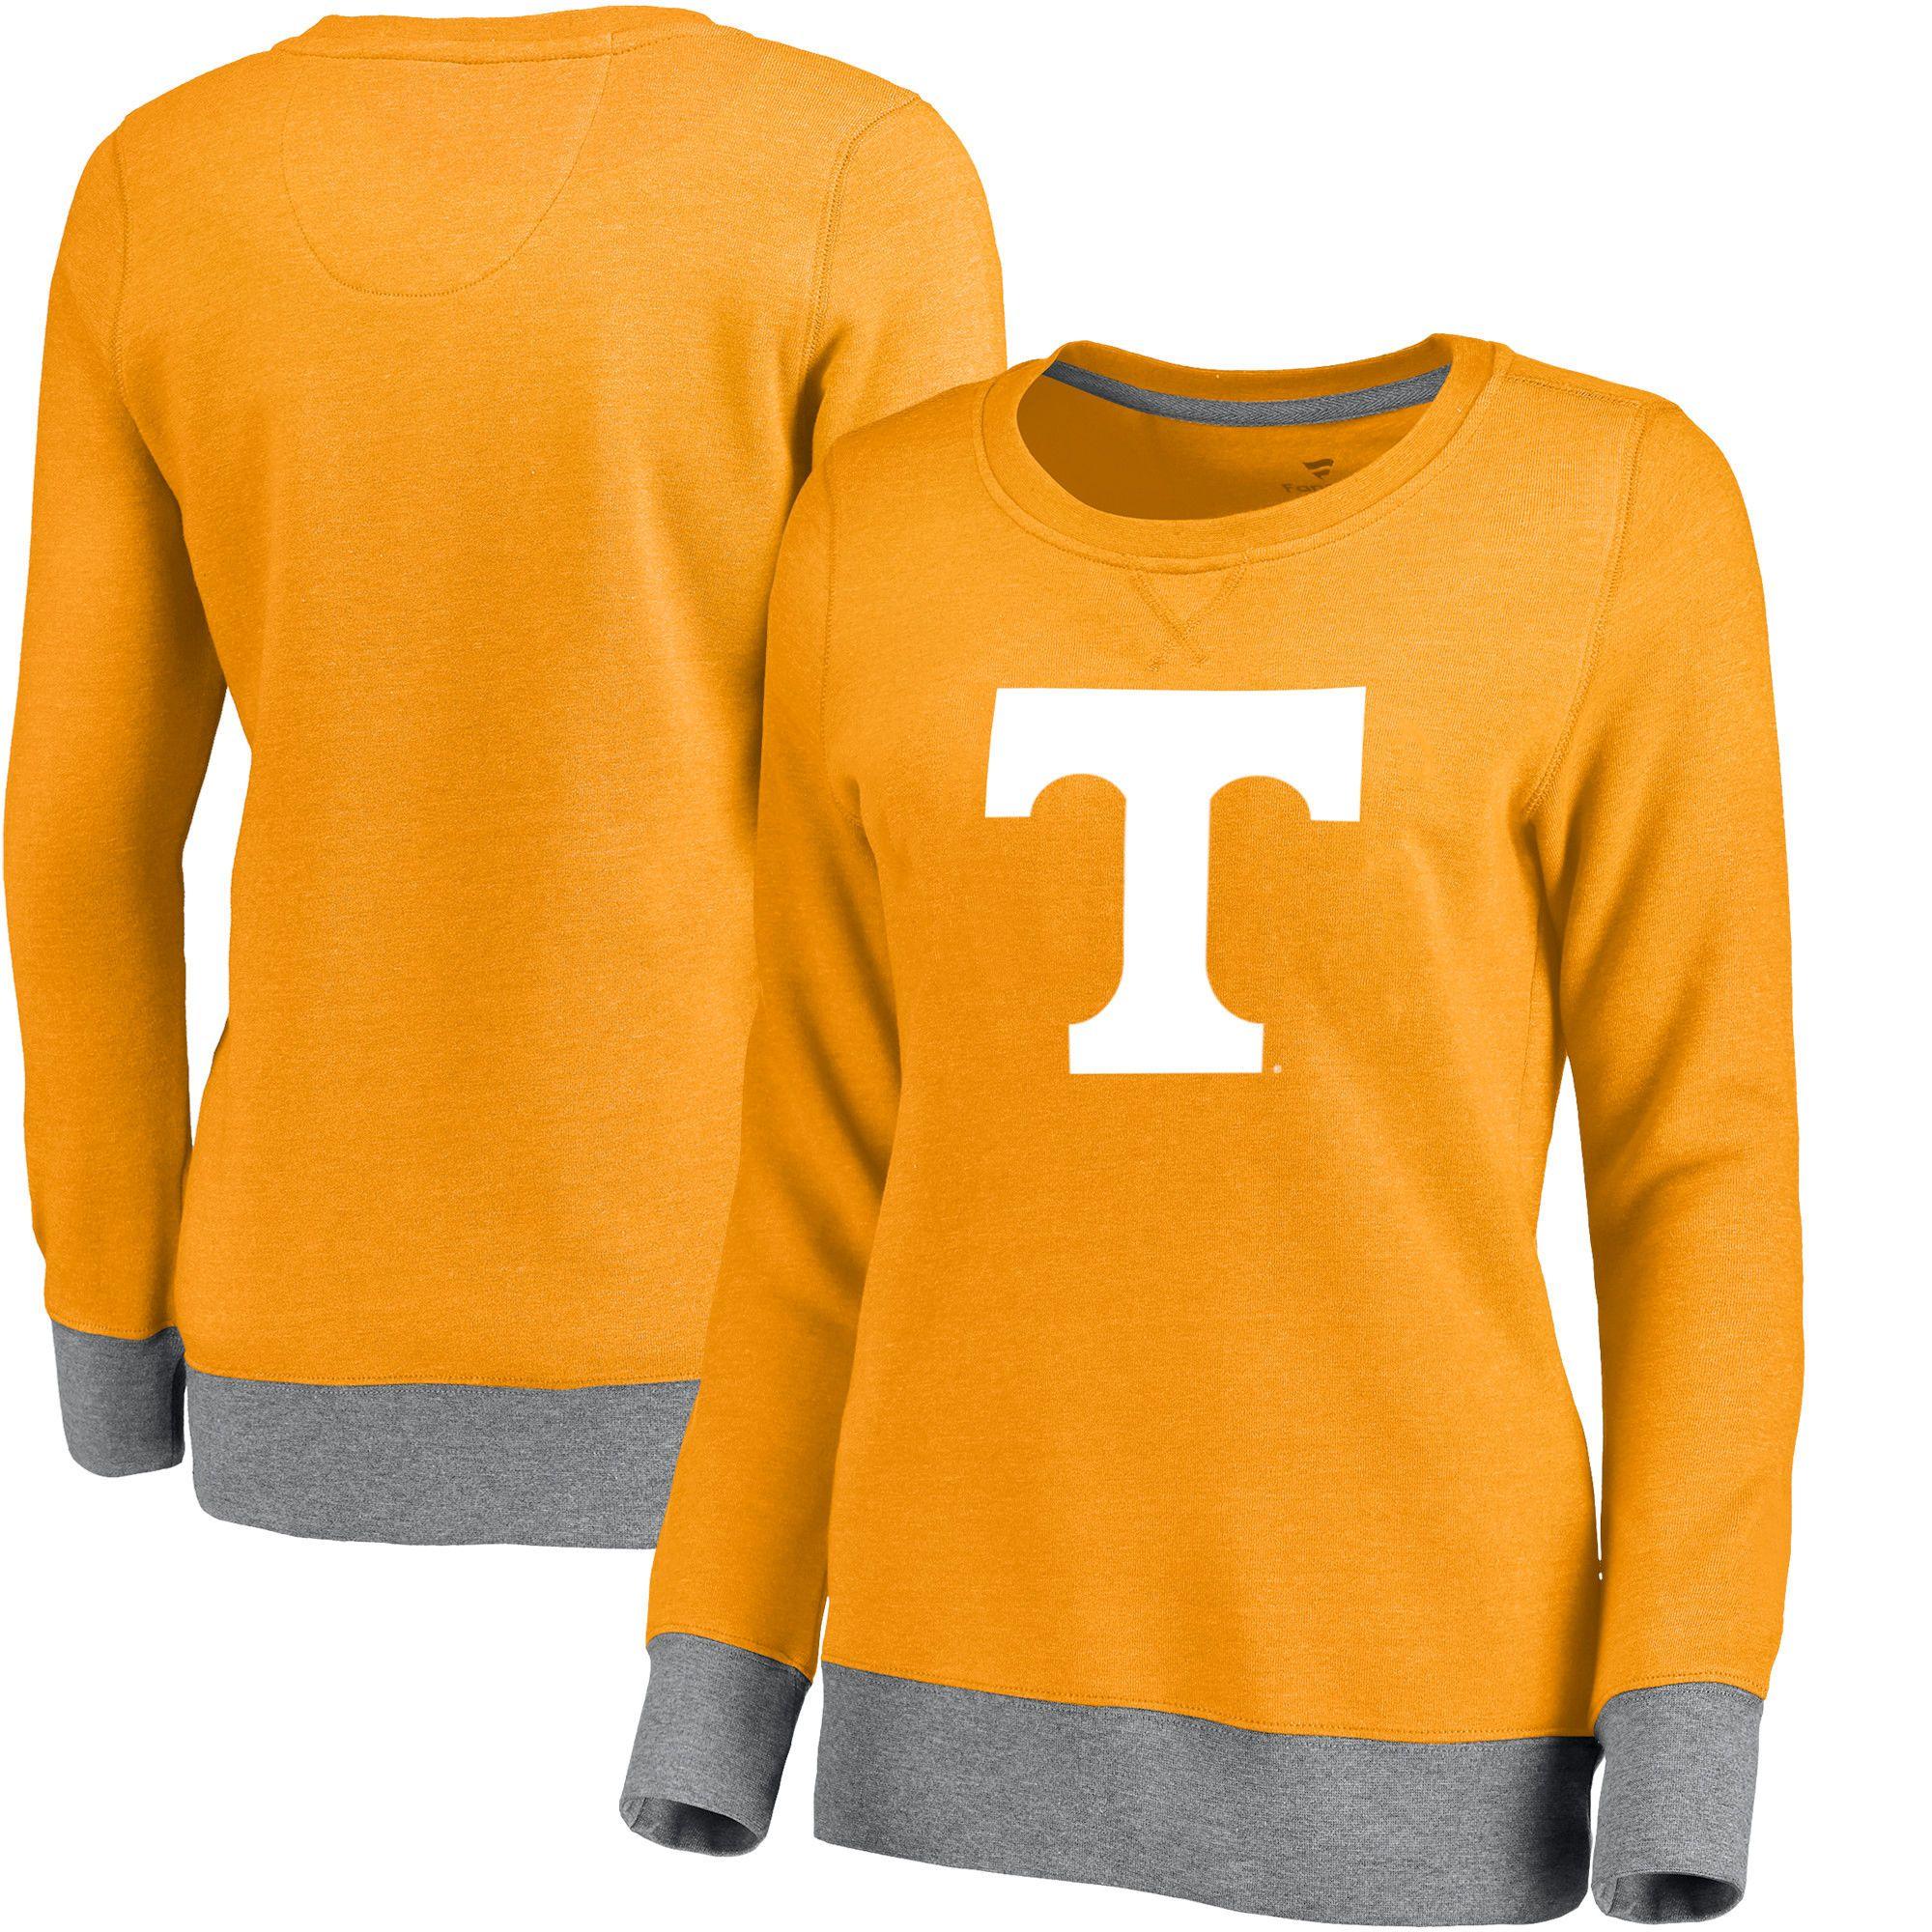 Tennessee Volunteers Women S Team Essentials Horizon Clean Color Heathered Crew Neck Tri Blend Sweatshirt Tenness Sweatshirts Sweatshirts Women Gameday Dress [ 2000 x 2000 Pixel ]